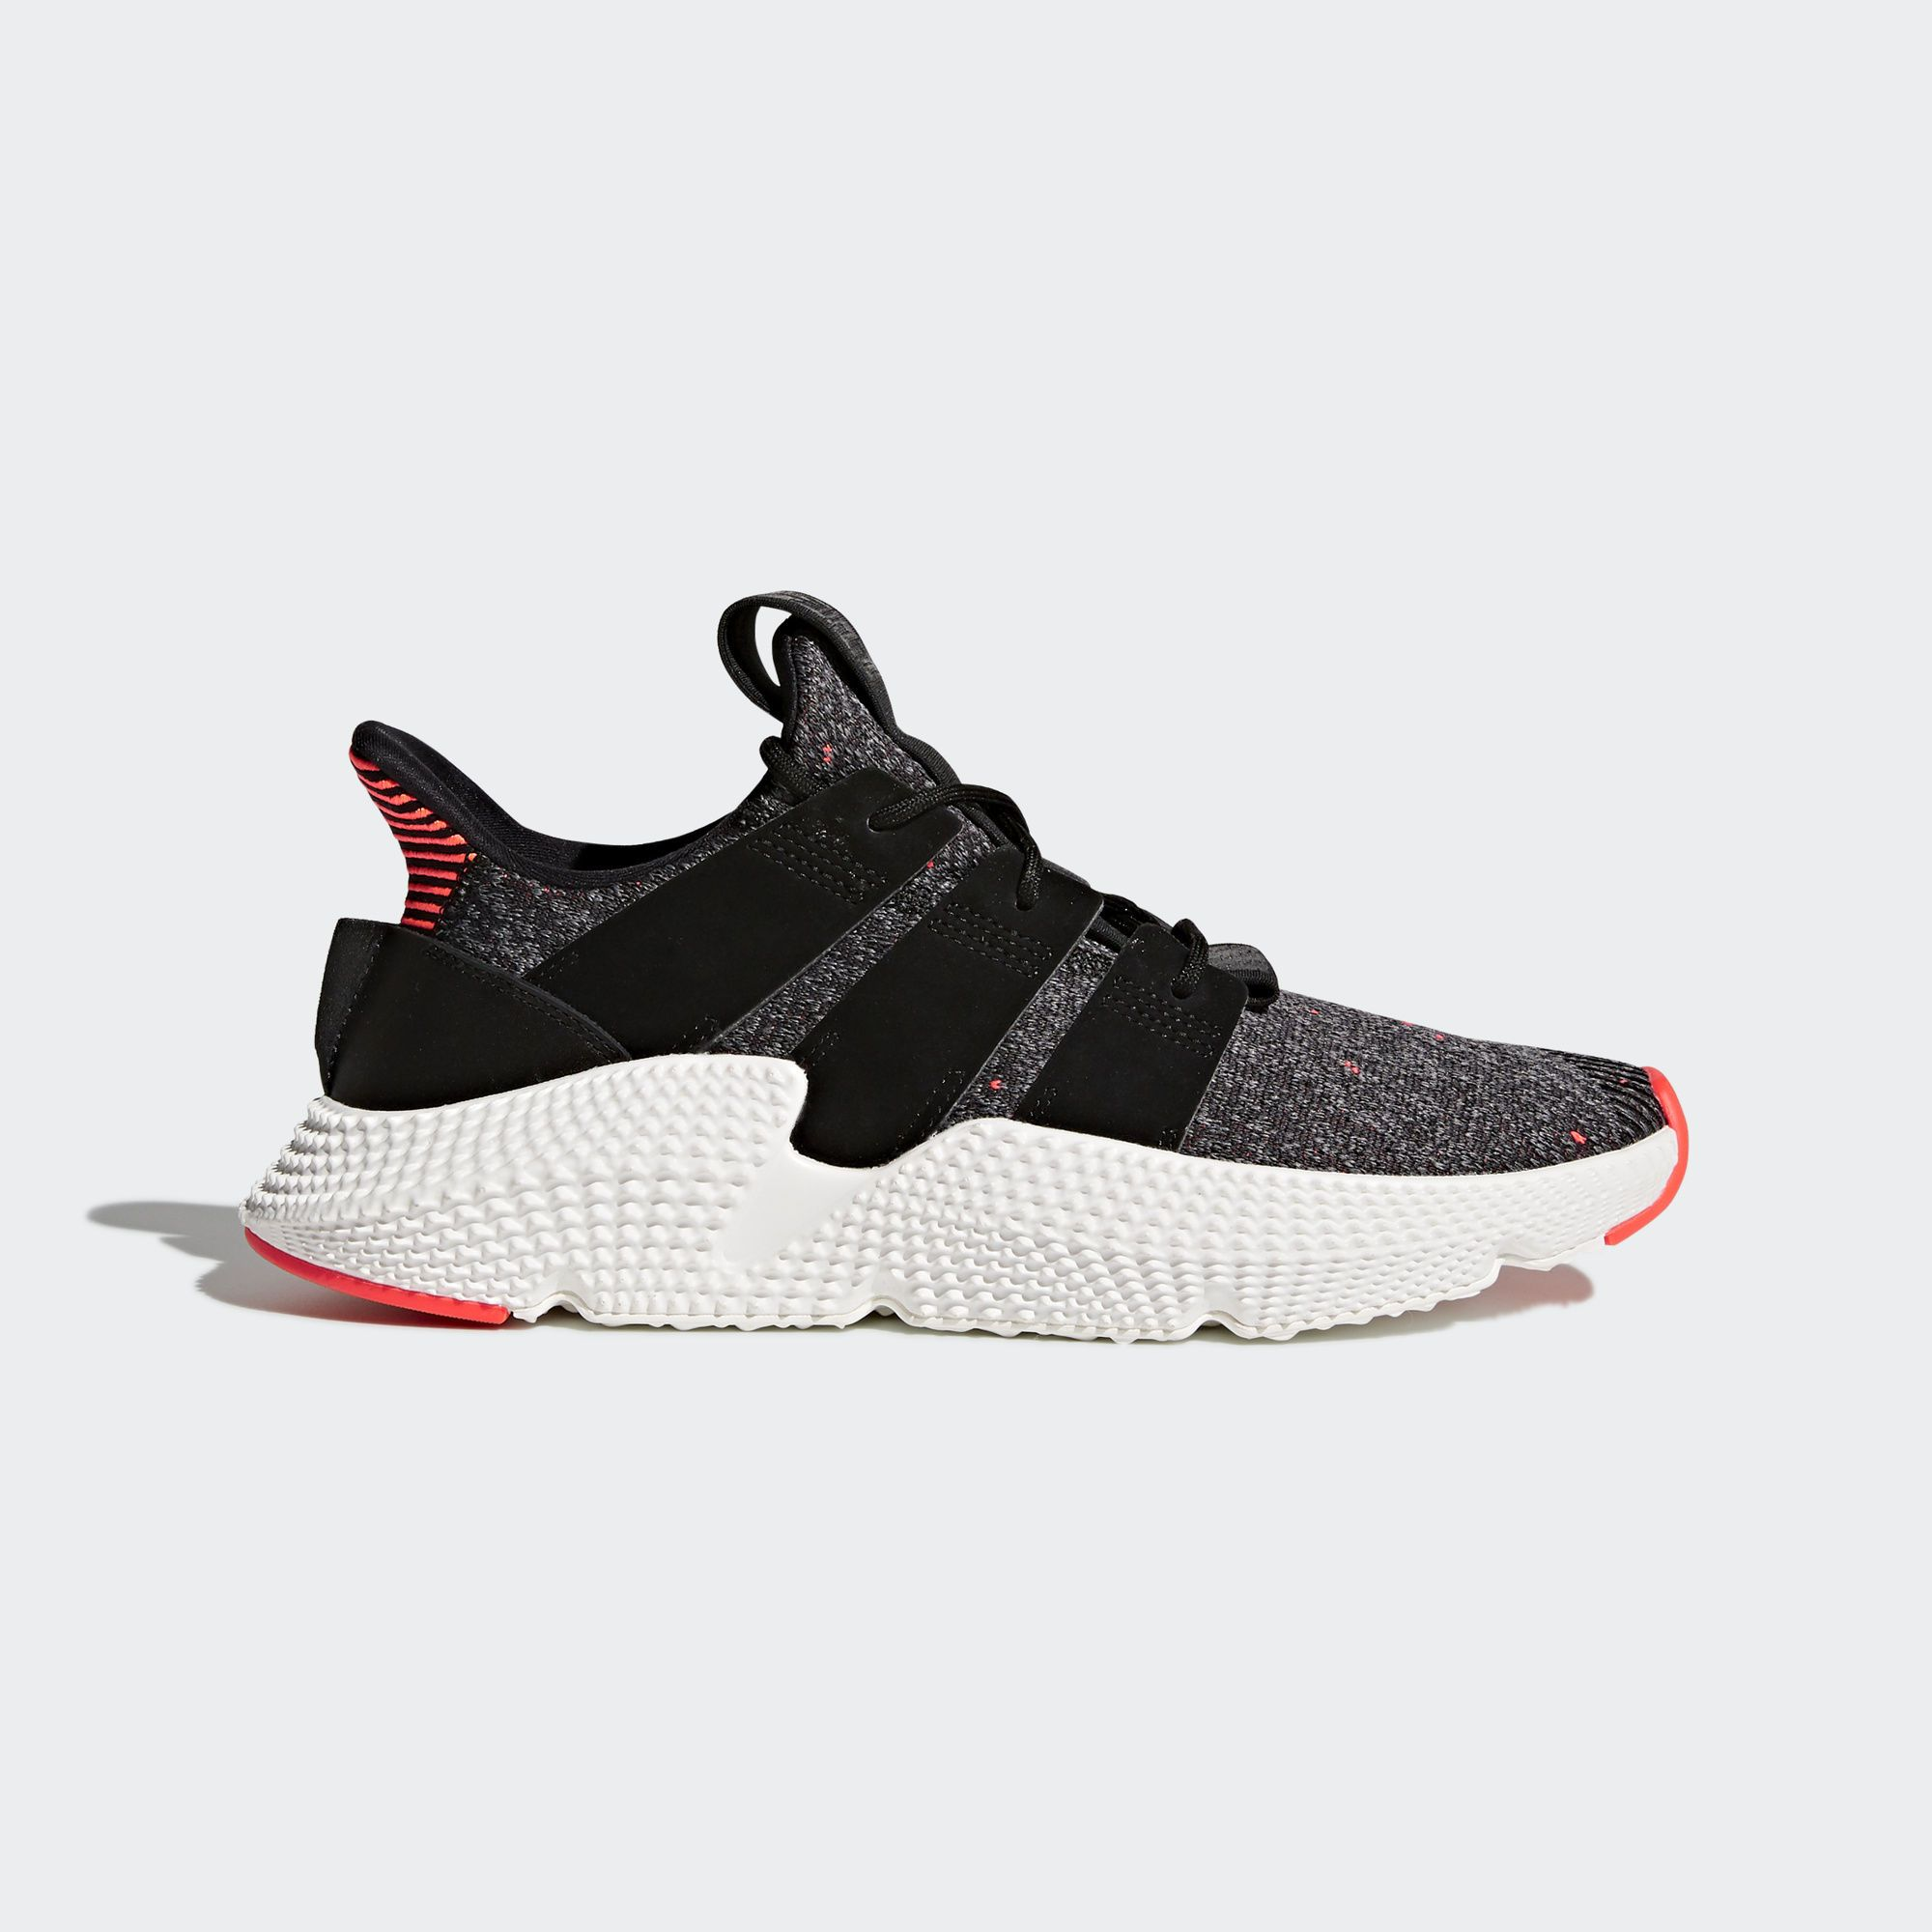 online retailer 1529b b1f6c Adidas Zapatillas Shoes Prophere Nike Hombre Pinterest Tenis 1EXpqwB